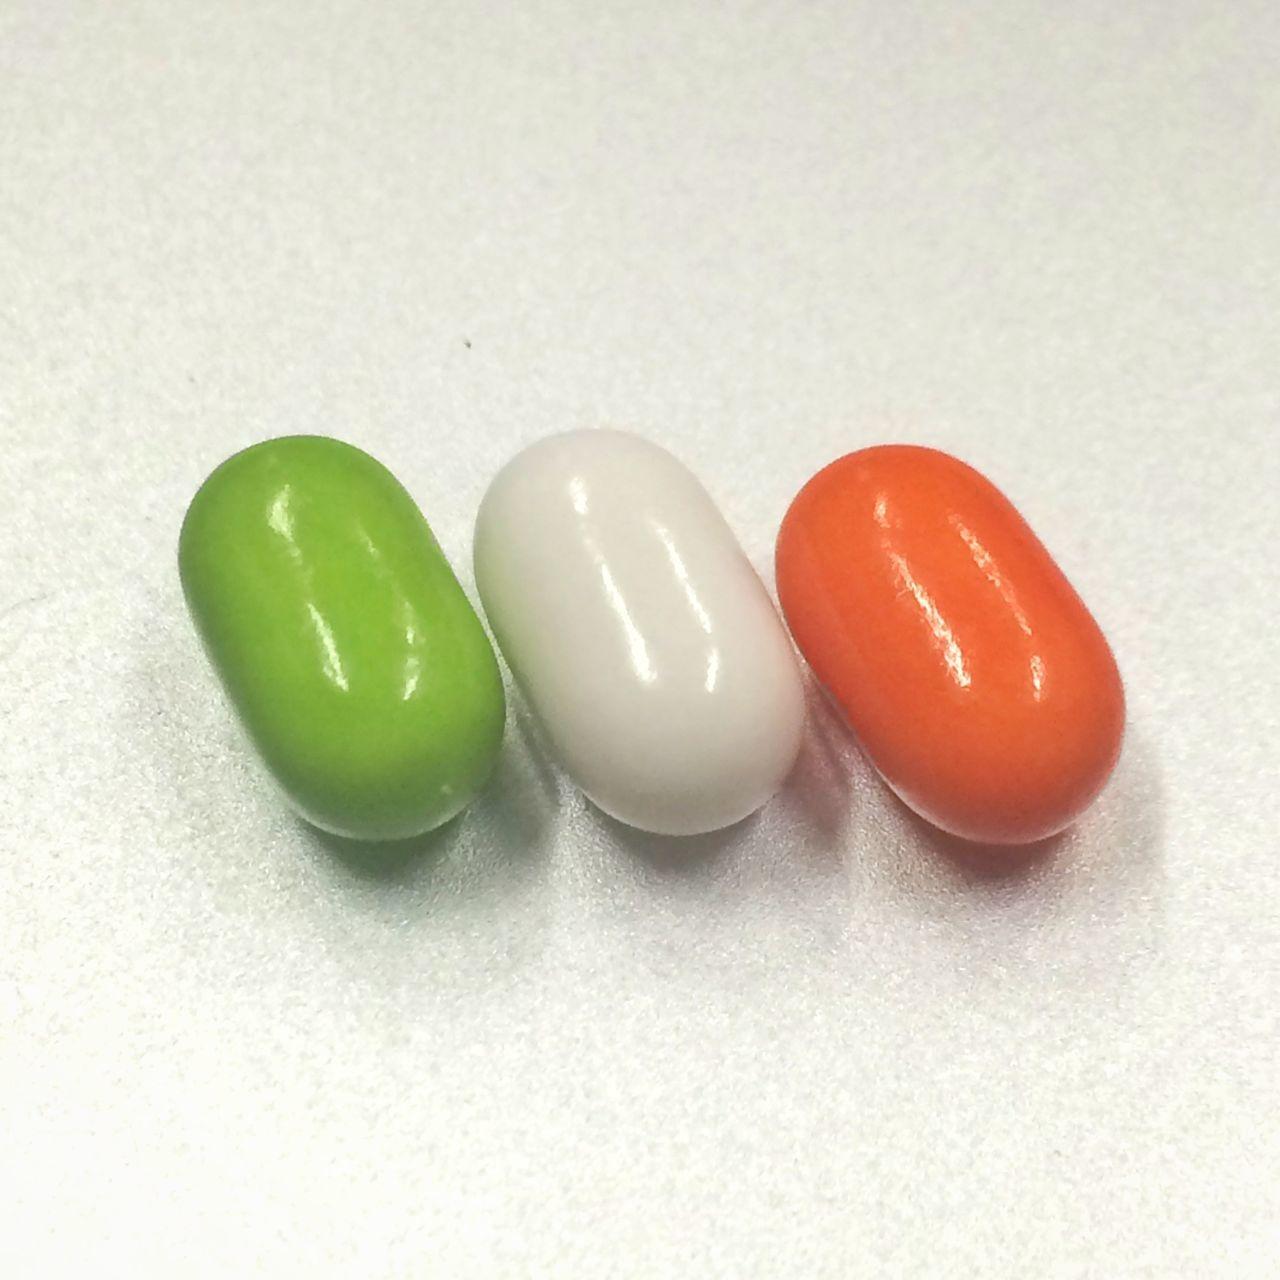 Candy Sweet Colors Italian Tic Tac